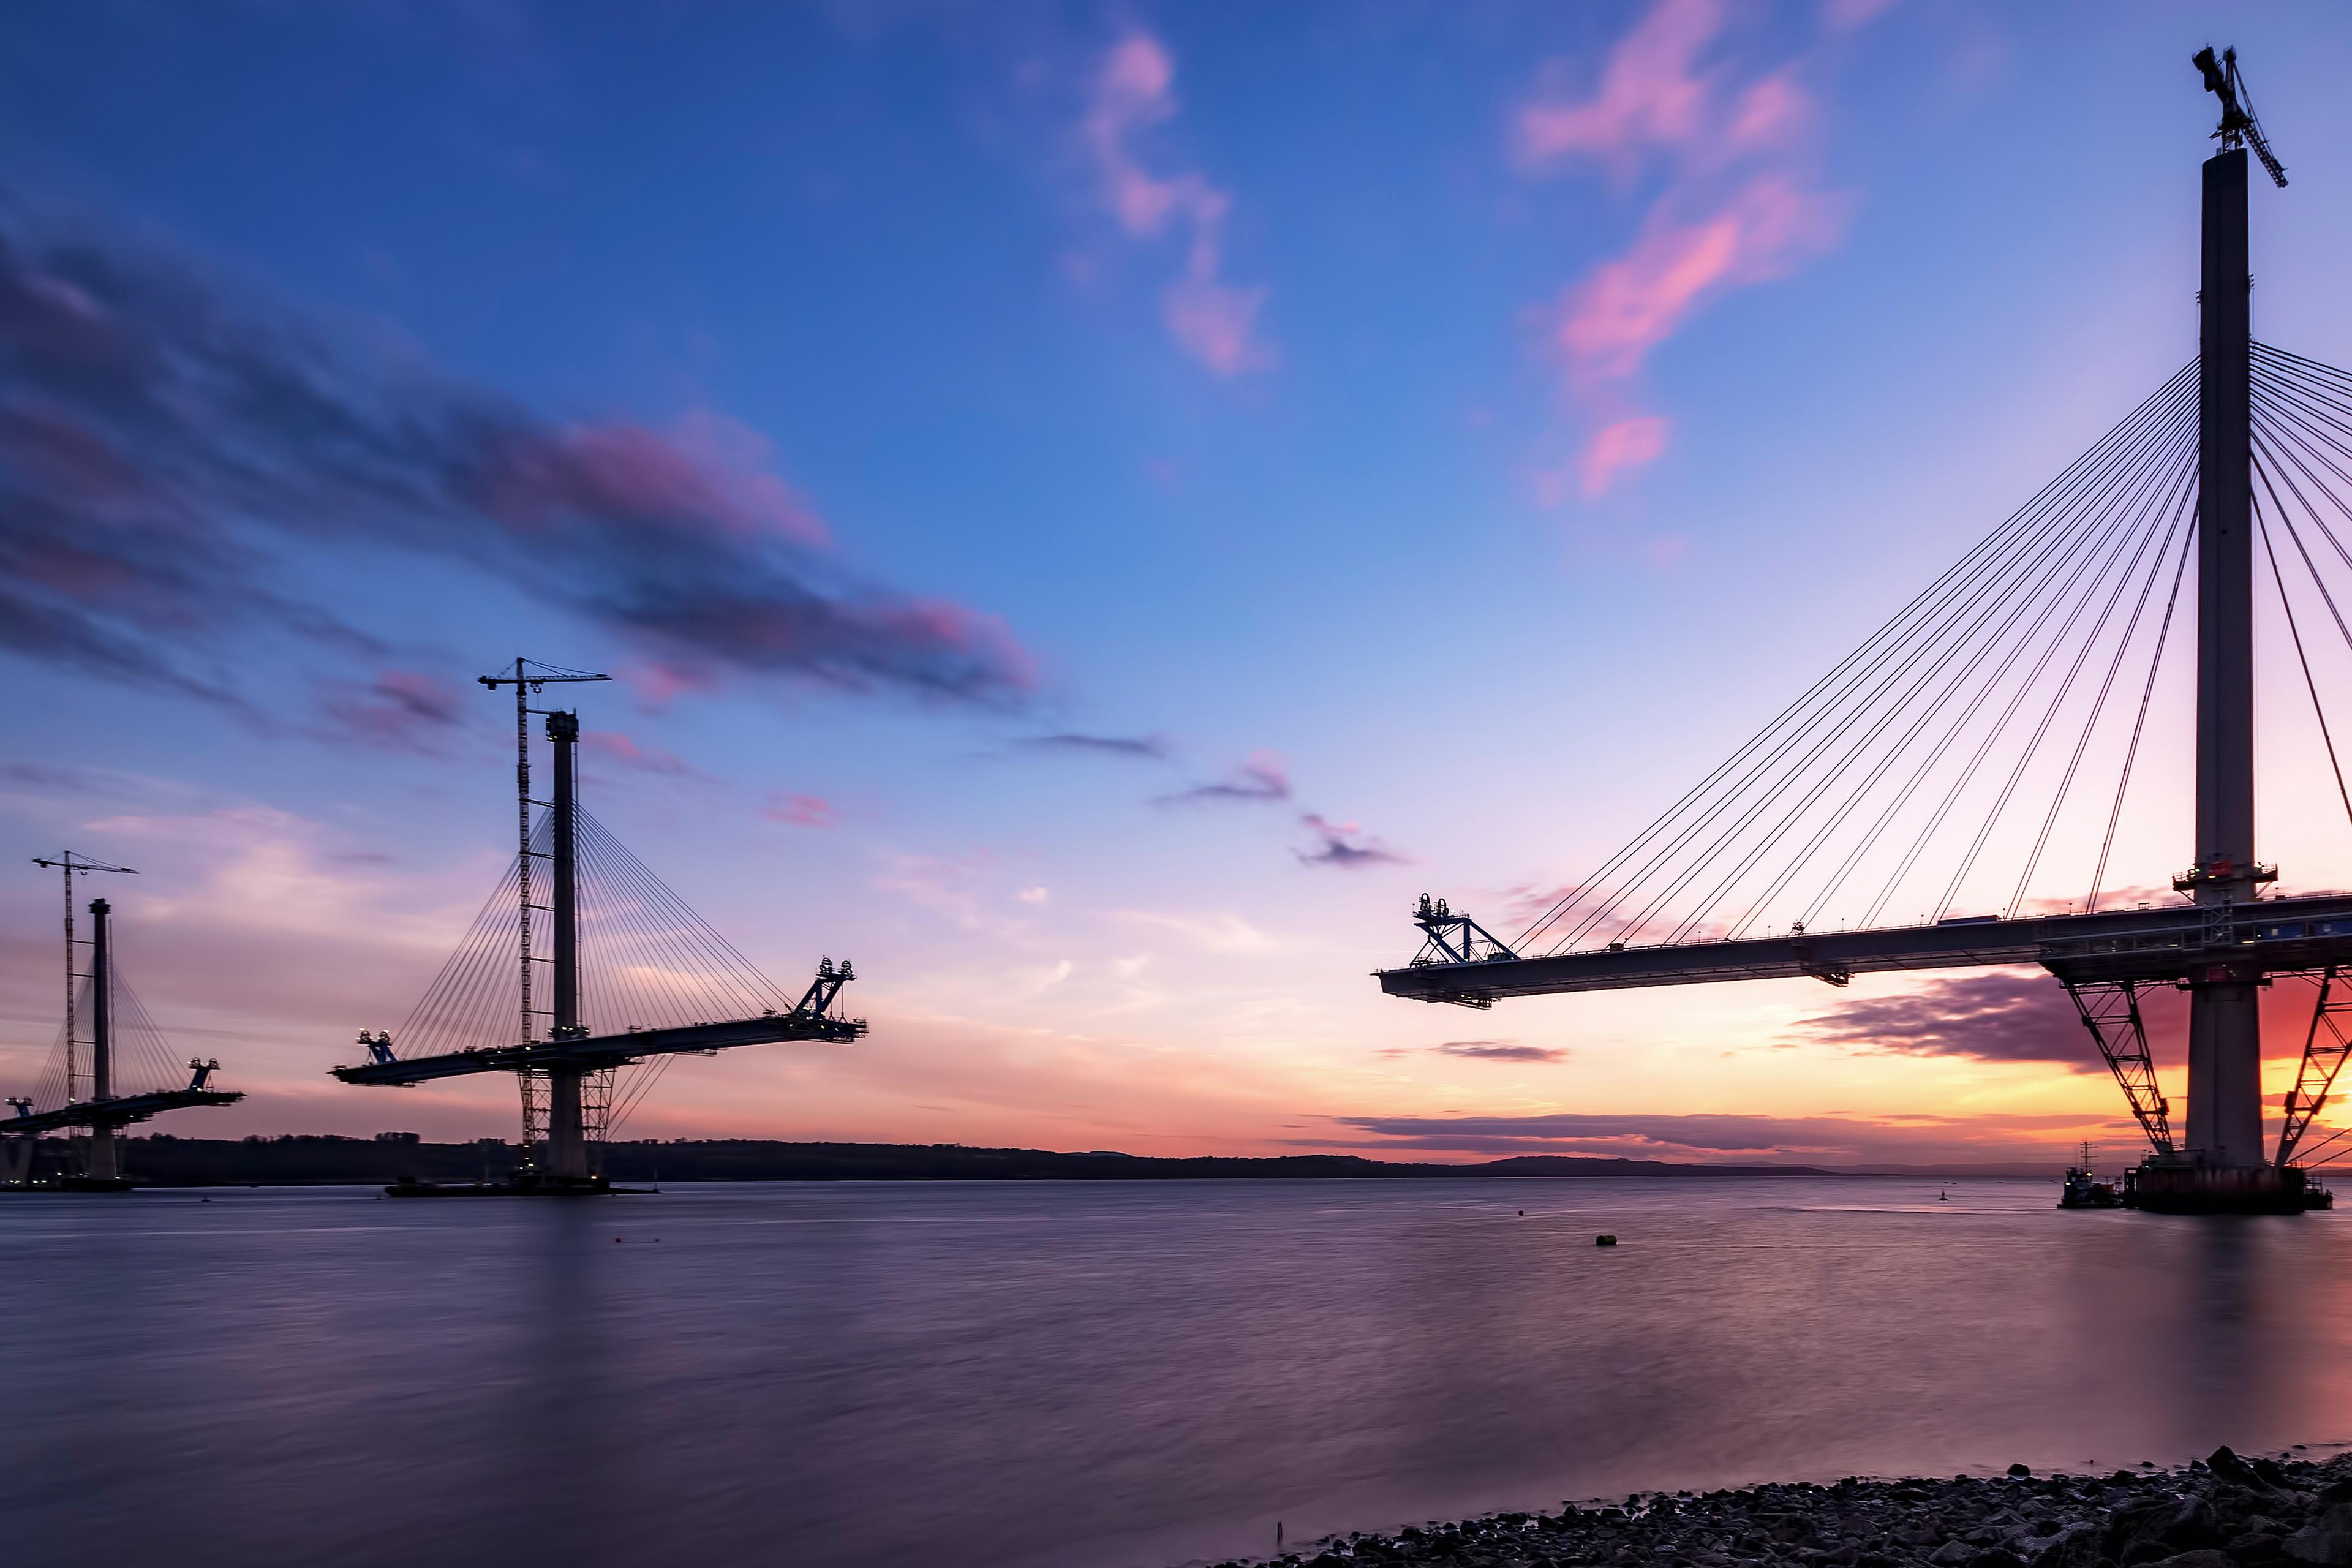 Construction Queensferry Crossing Bridge sunset